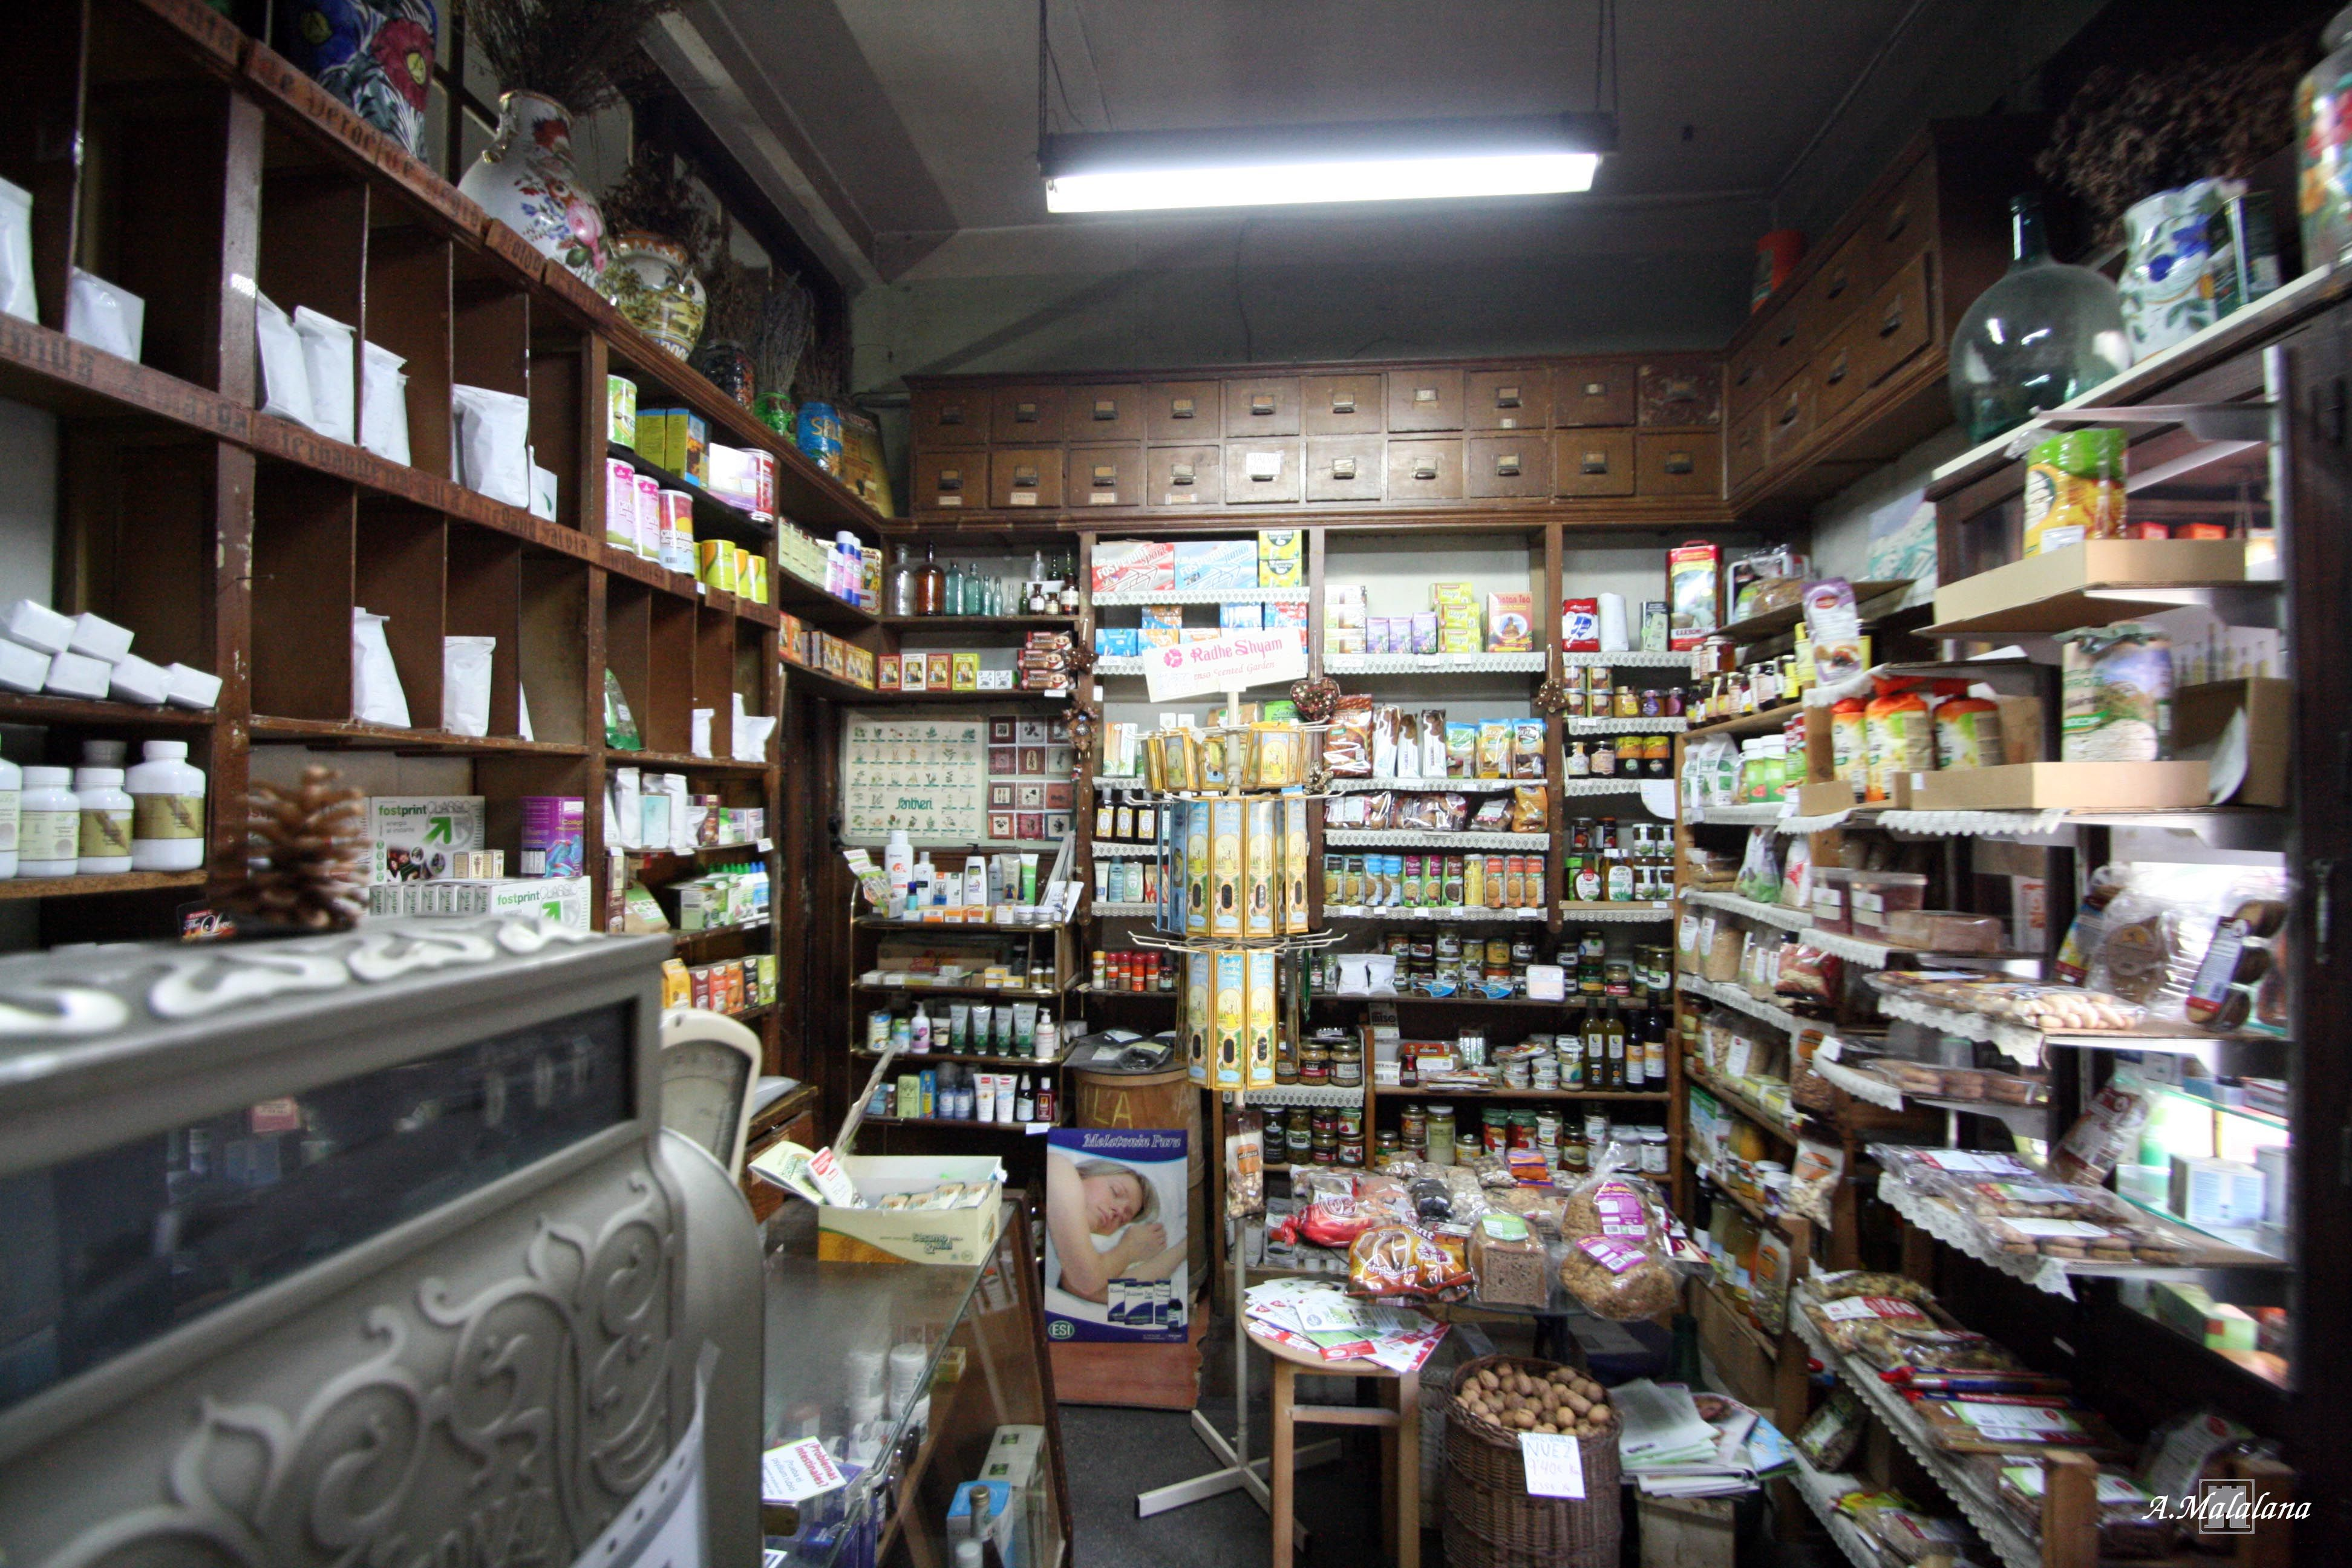 Herbolario Santa Ana Las Mil Flores Calle Acuerdo 31 Barrio De Maravillas Santa Ana Eres Maravilloso Calle